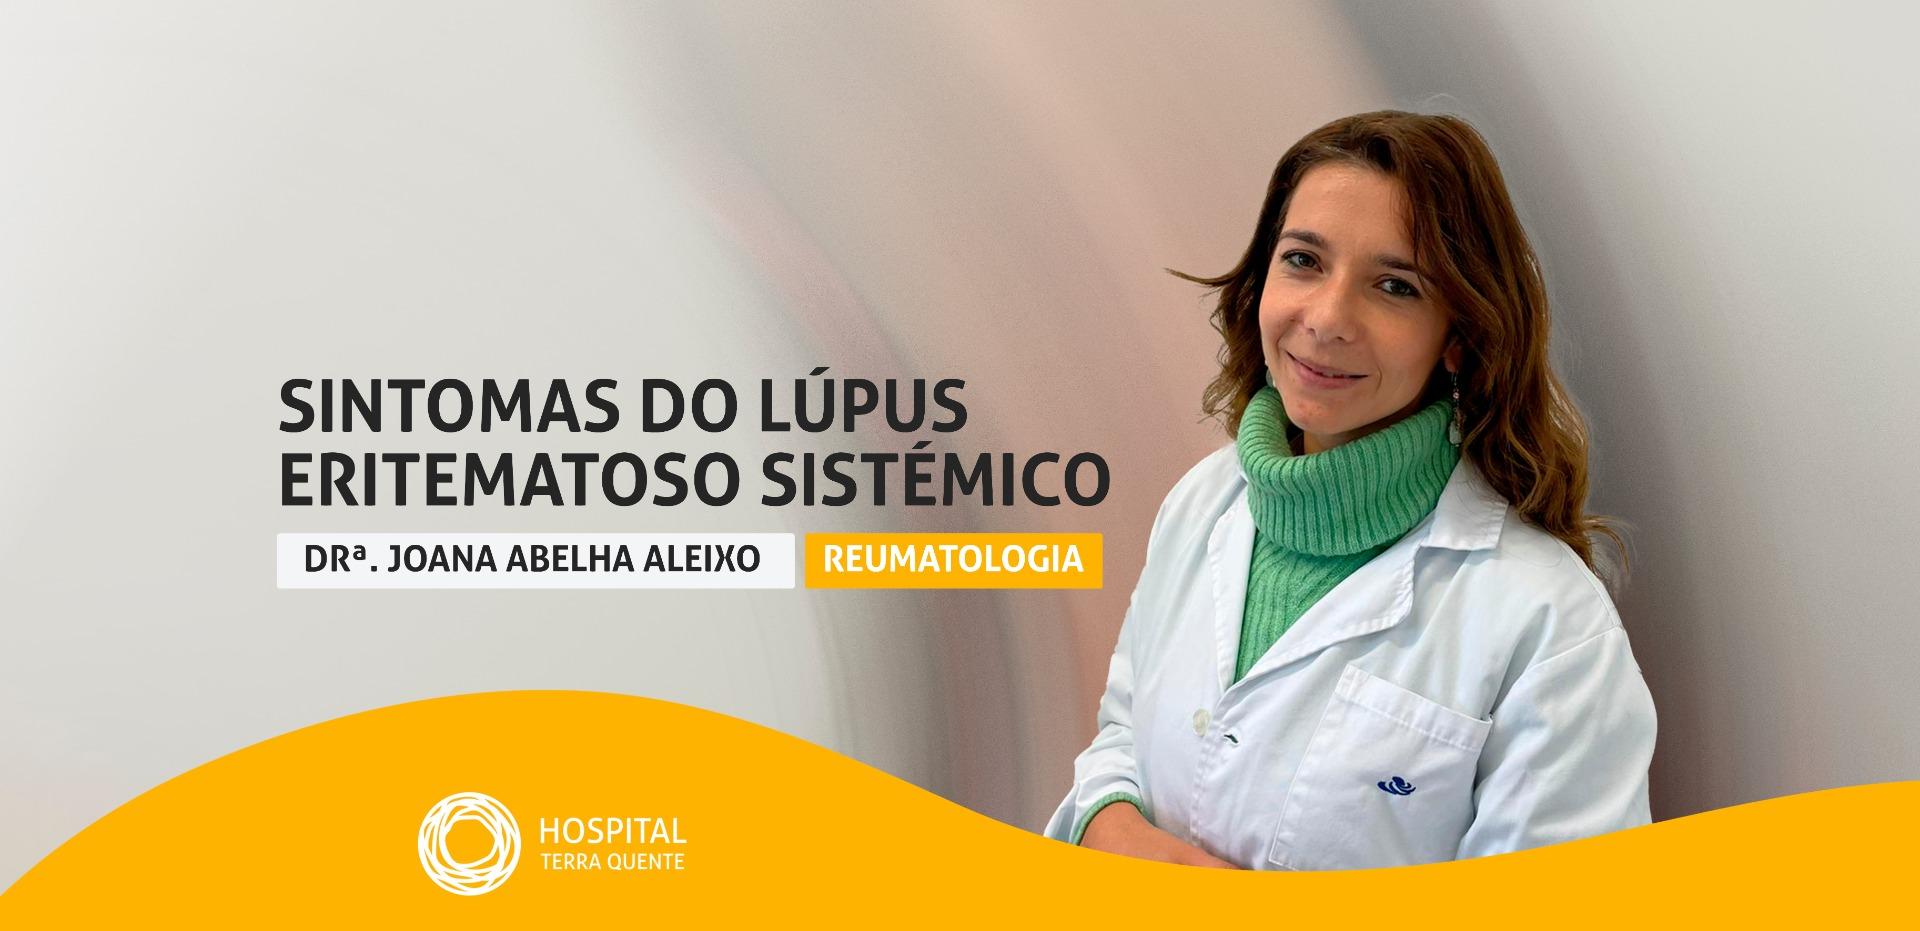 Lúpus Eritematoso Sistémico (LES): Conheça os sintomas e as suas causas